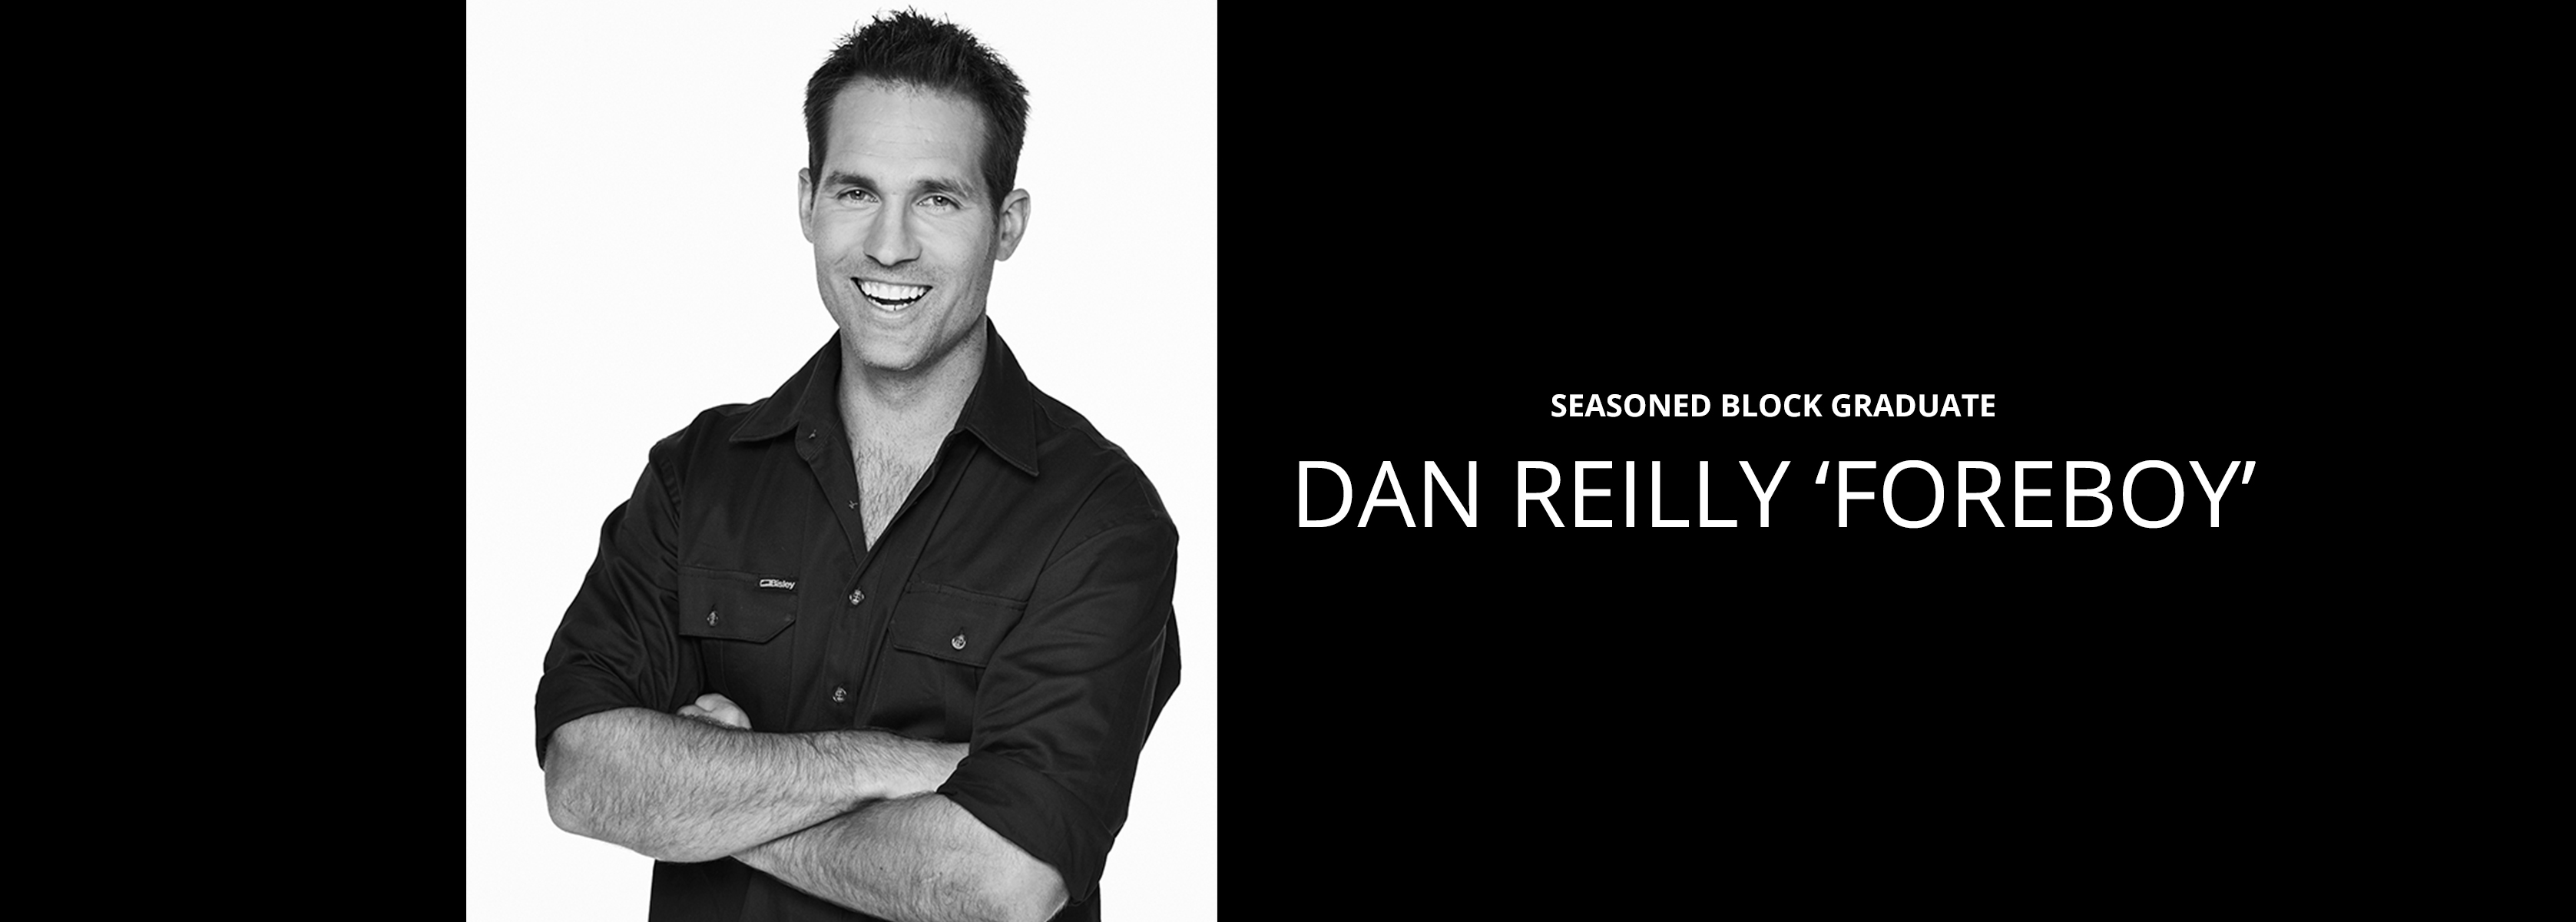 Dan Reilly - Seasoned Block Graduate - Bravo Talent Management